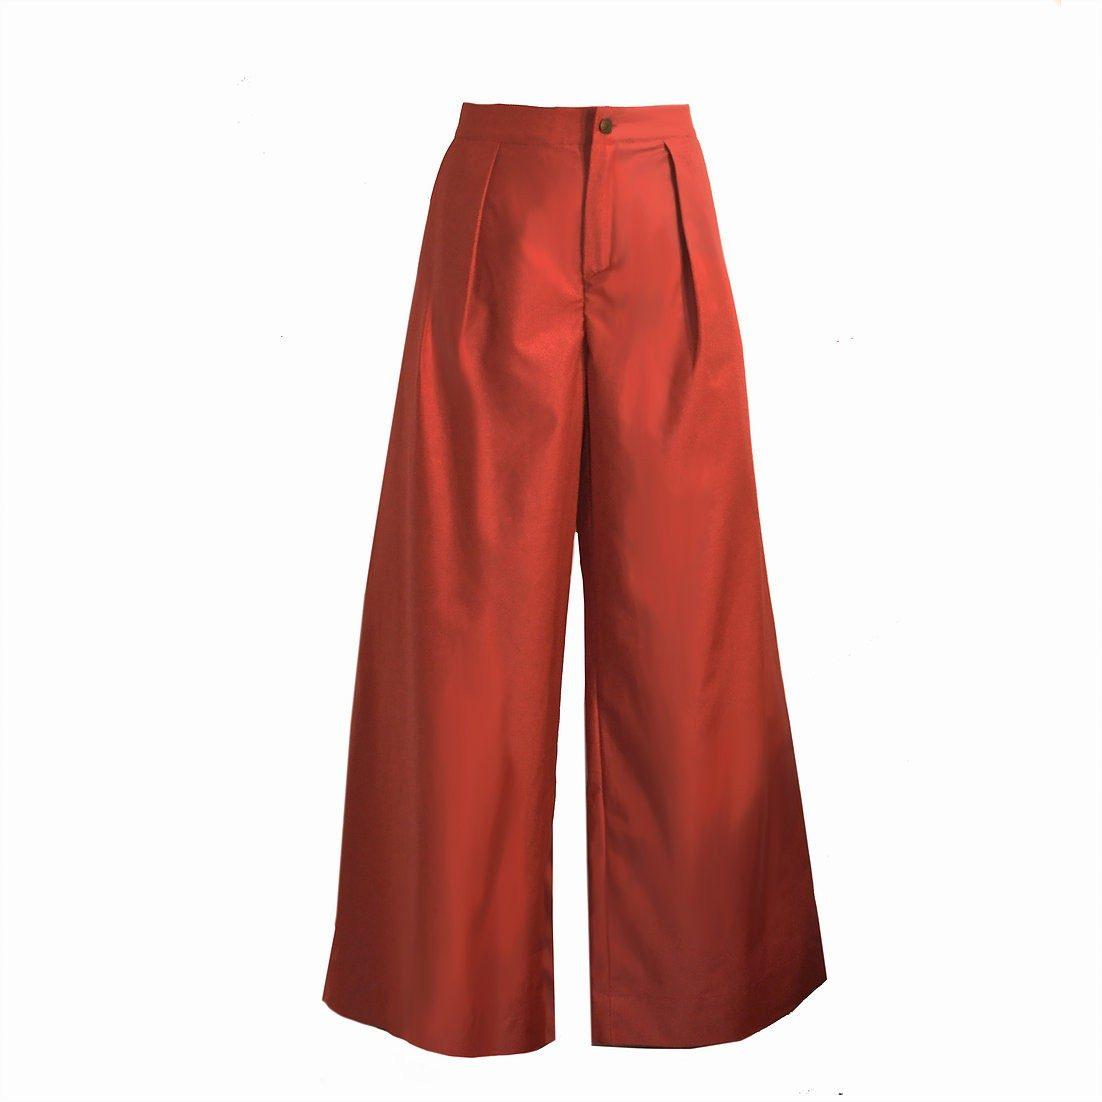 Wylde - Pantalon Maud